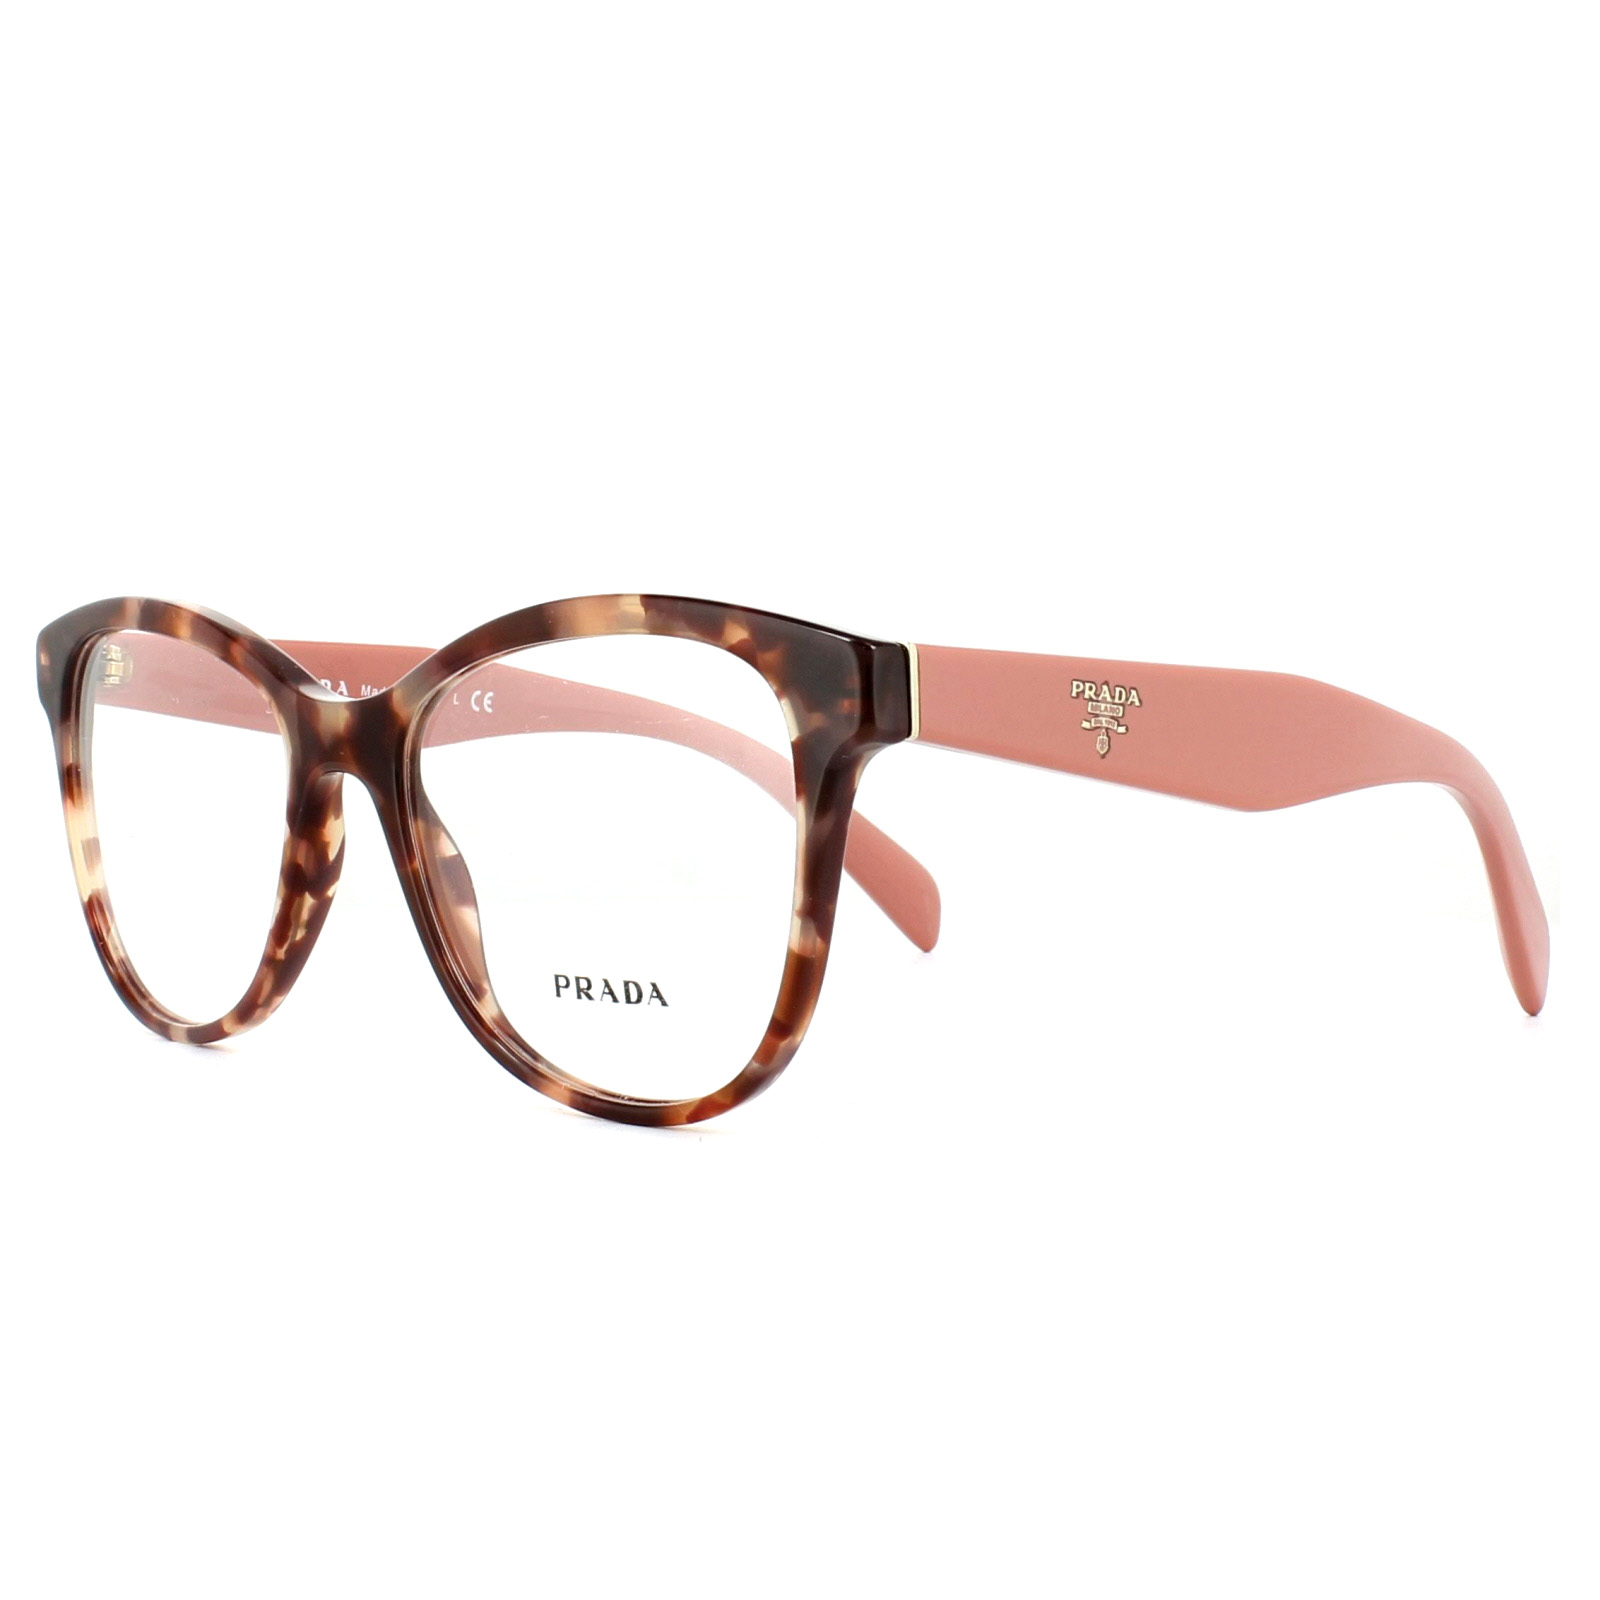 3c153c35c961 Sentinel Prada Glasses Frames PR12TV UE01O1 Pink Havana 51mm Womens